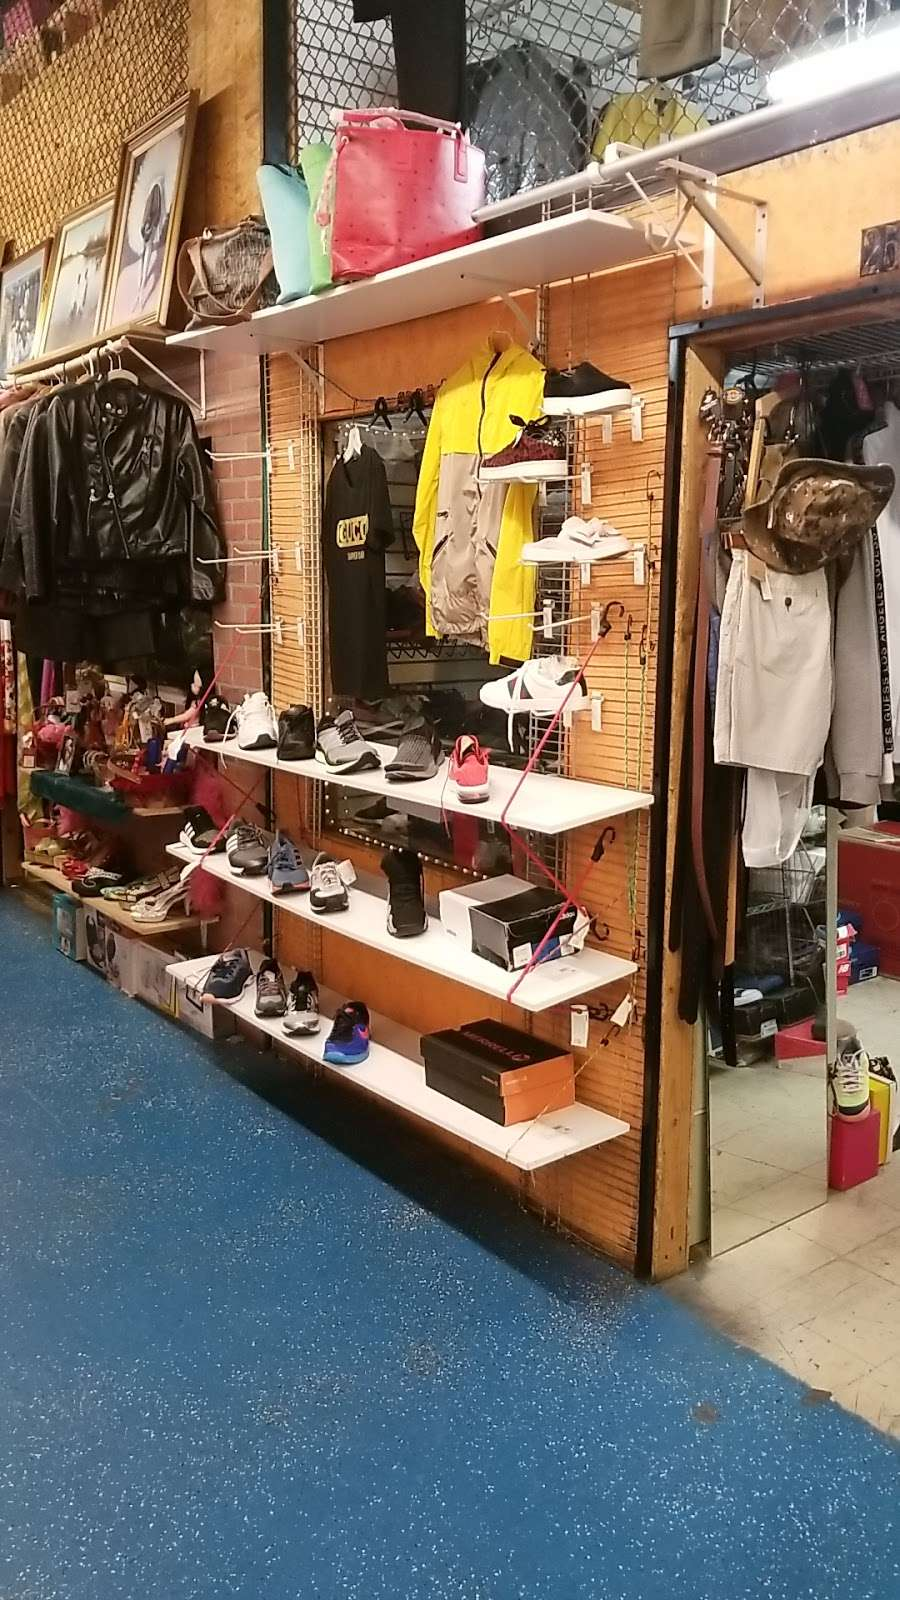 Jerrys Corner - clothing store  | Photo 4 of 9 | Address: 6039 Passyunk Ave, Philadelphia, PA 19153, USA | Phone: (215) 726-6607